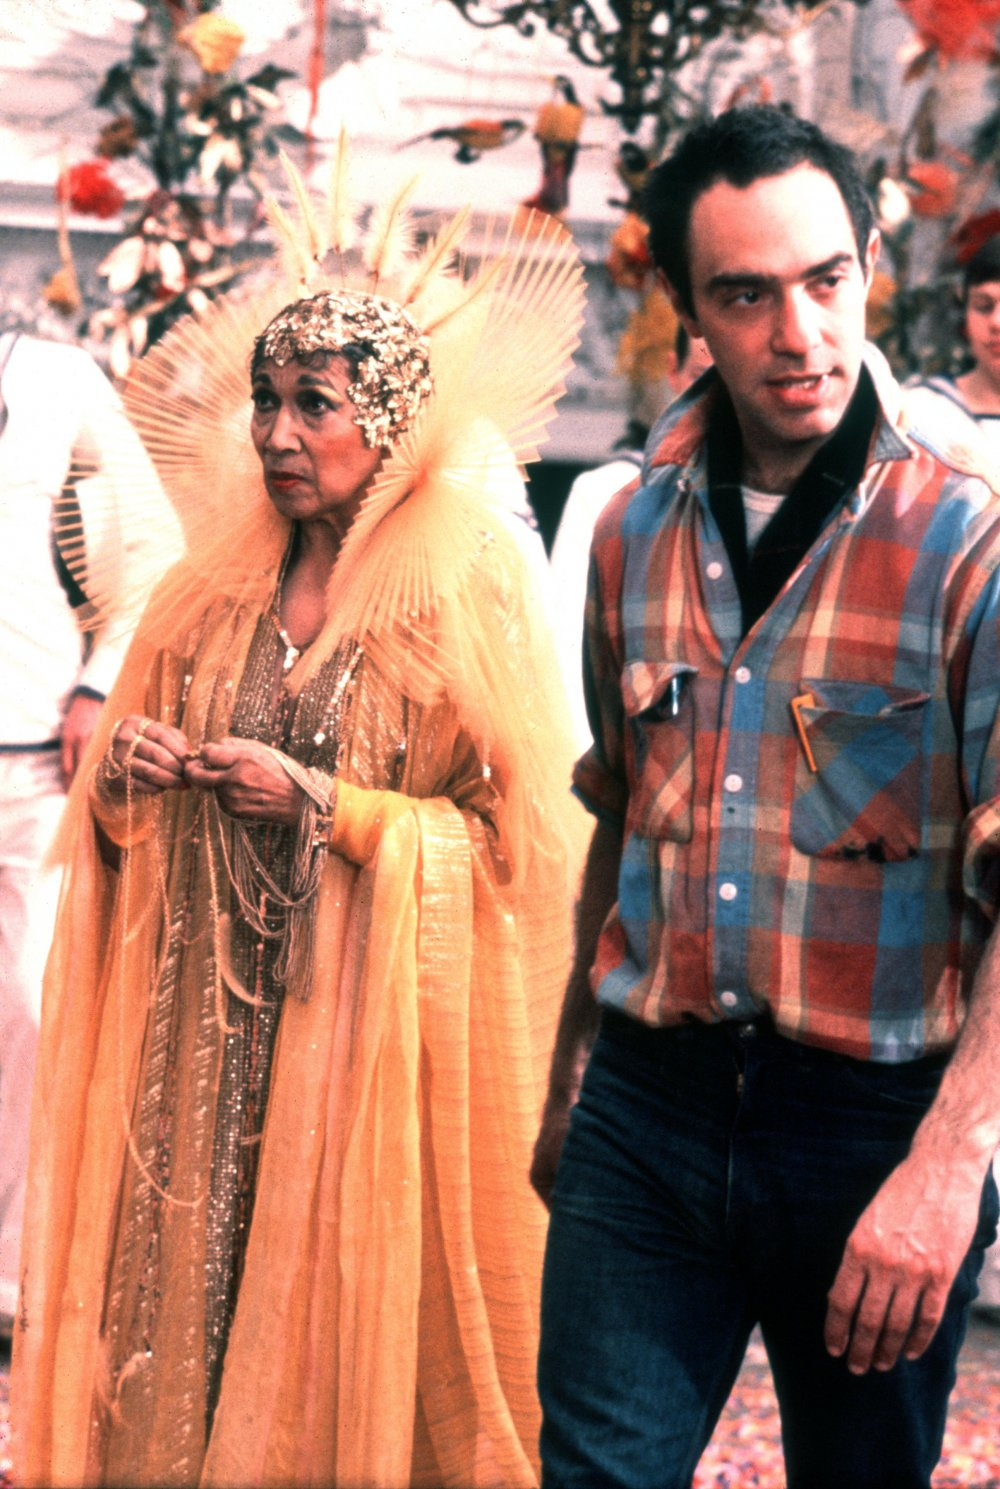 Derek Jarman with actor Elisabeth Welch on the set of The Tempest (1979)